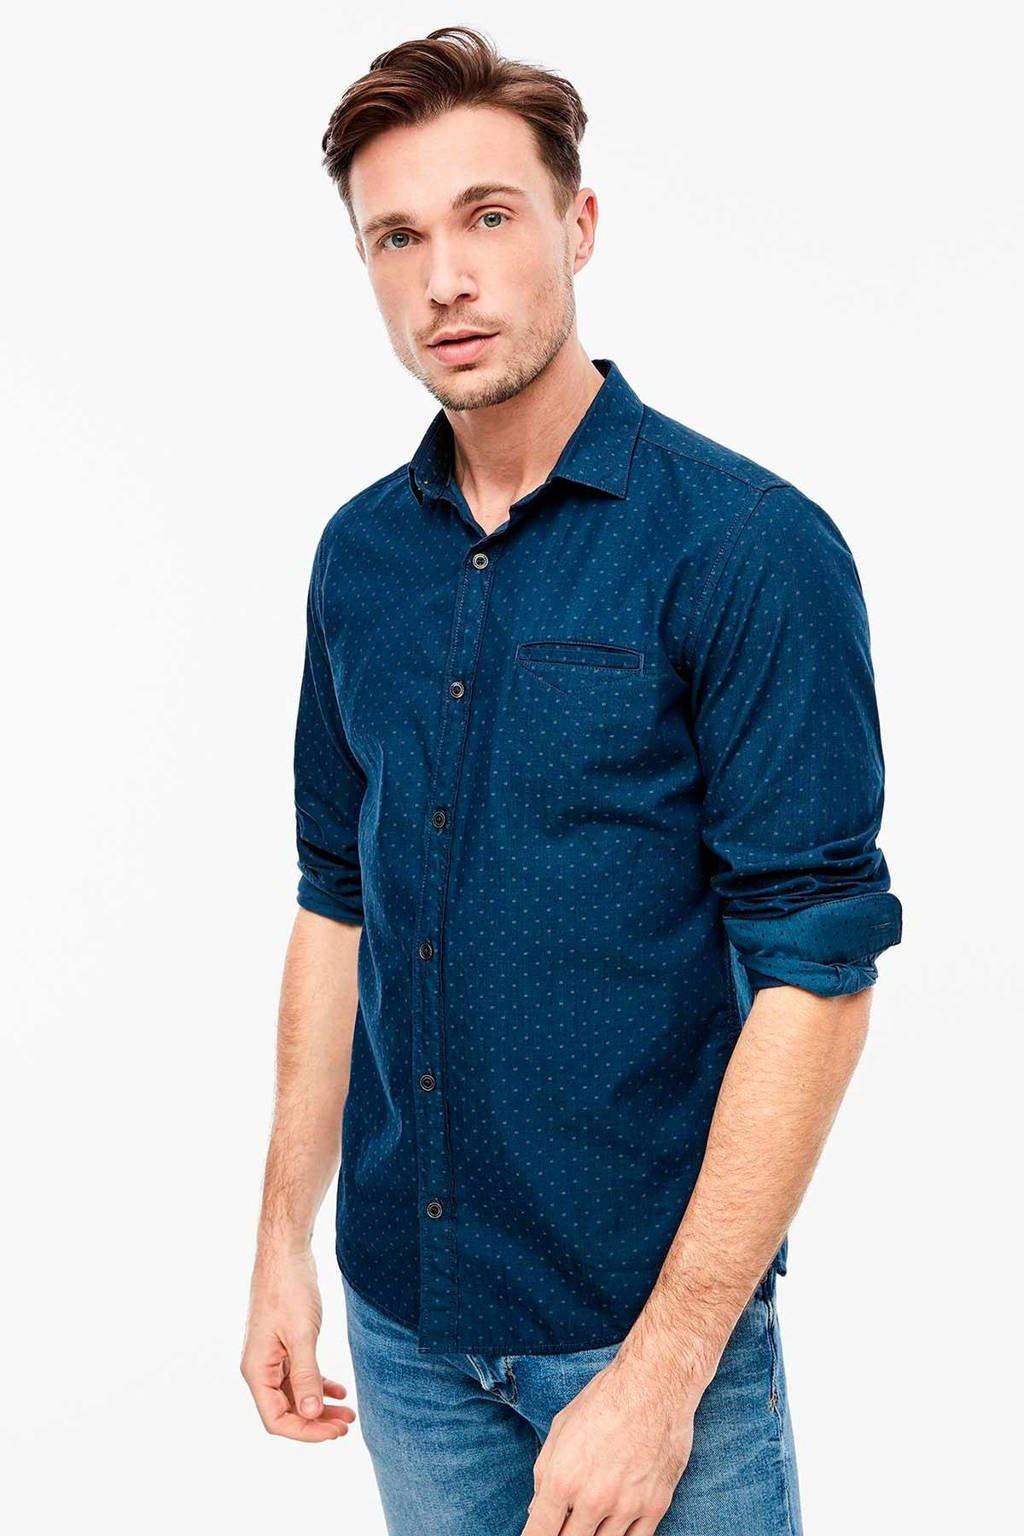 s.Oliver gemêleerd regular fit overhemd donkerblauw, Donkerblauw